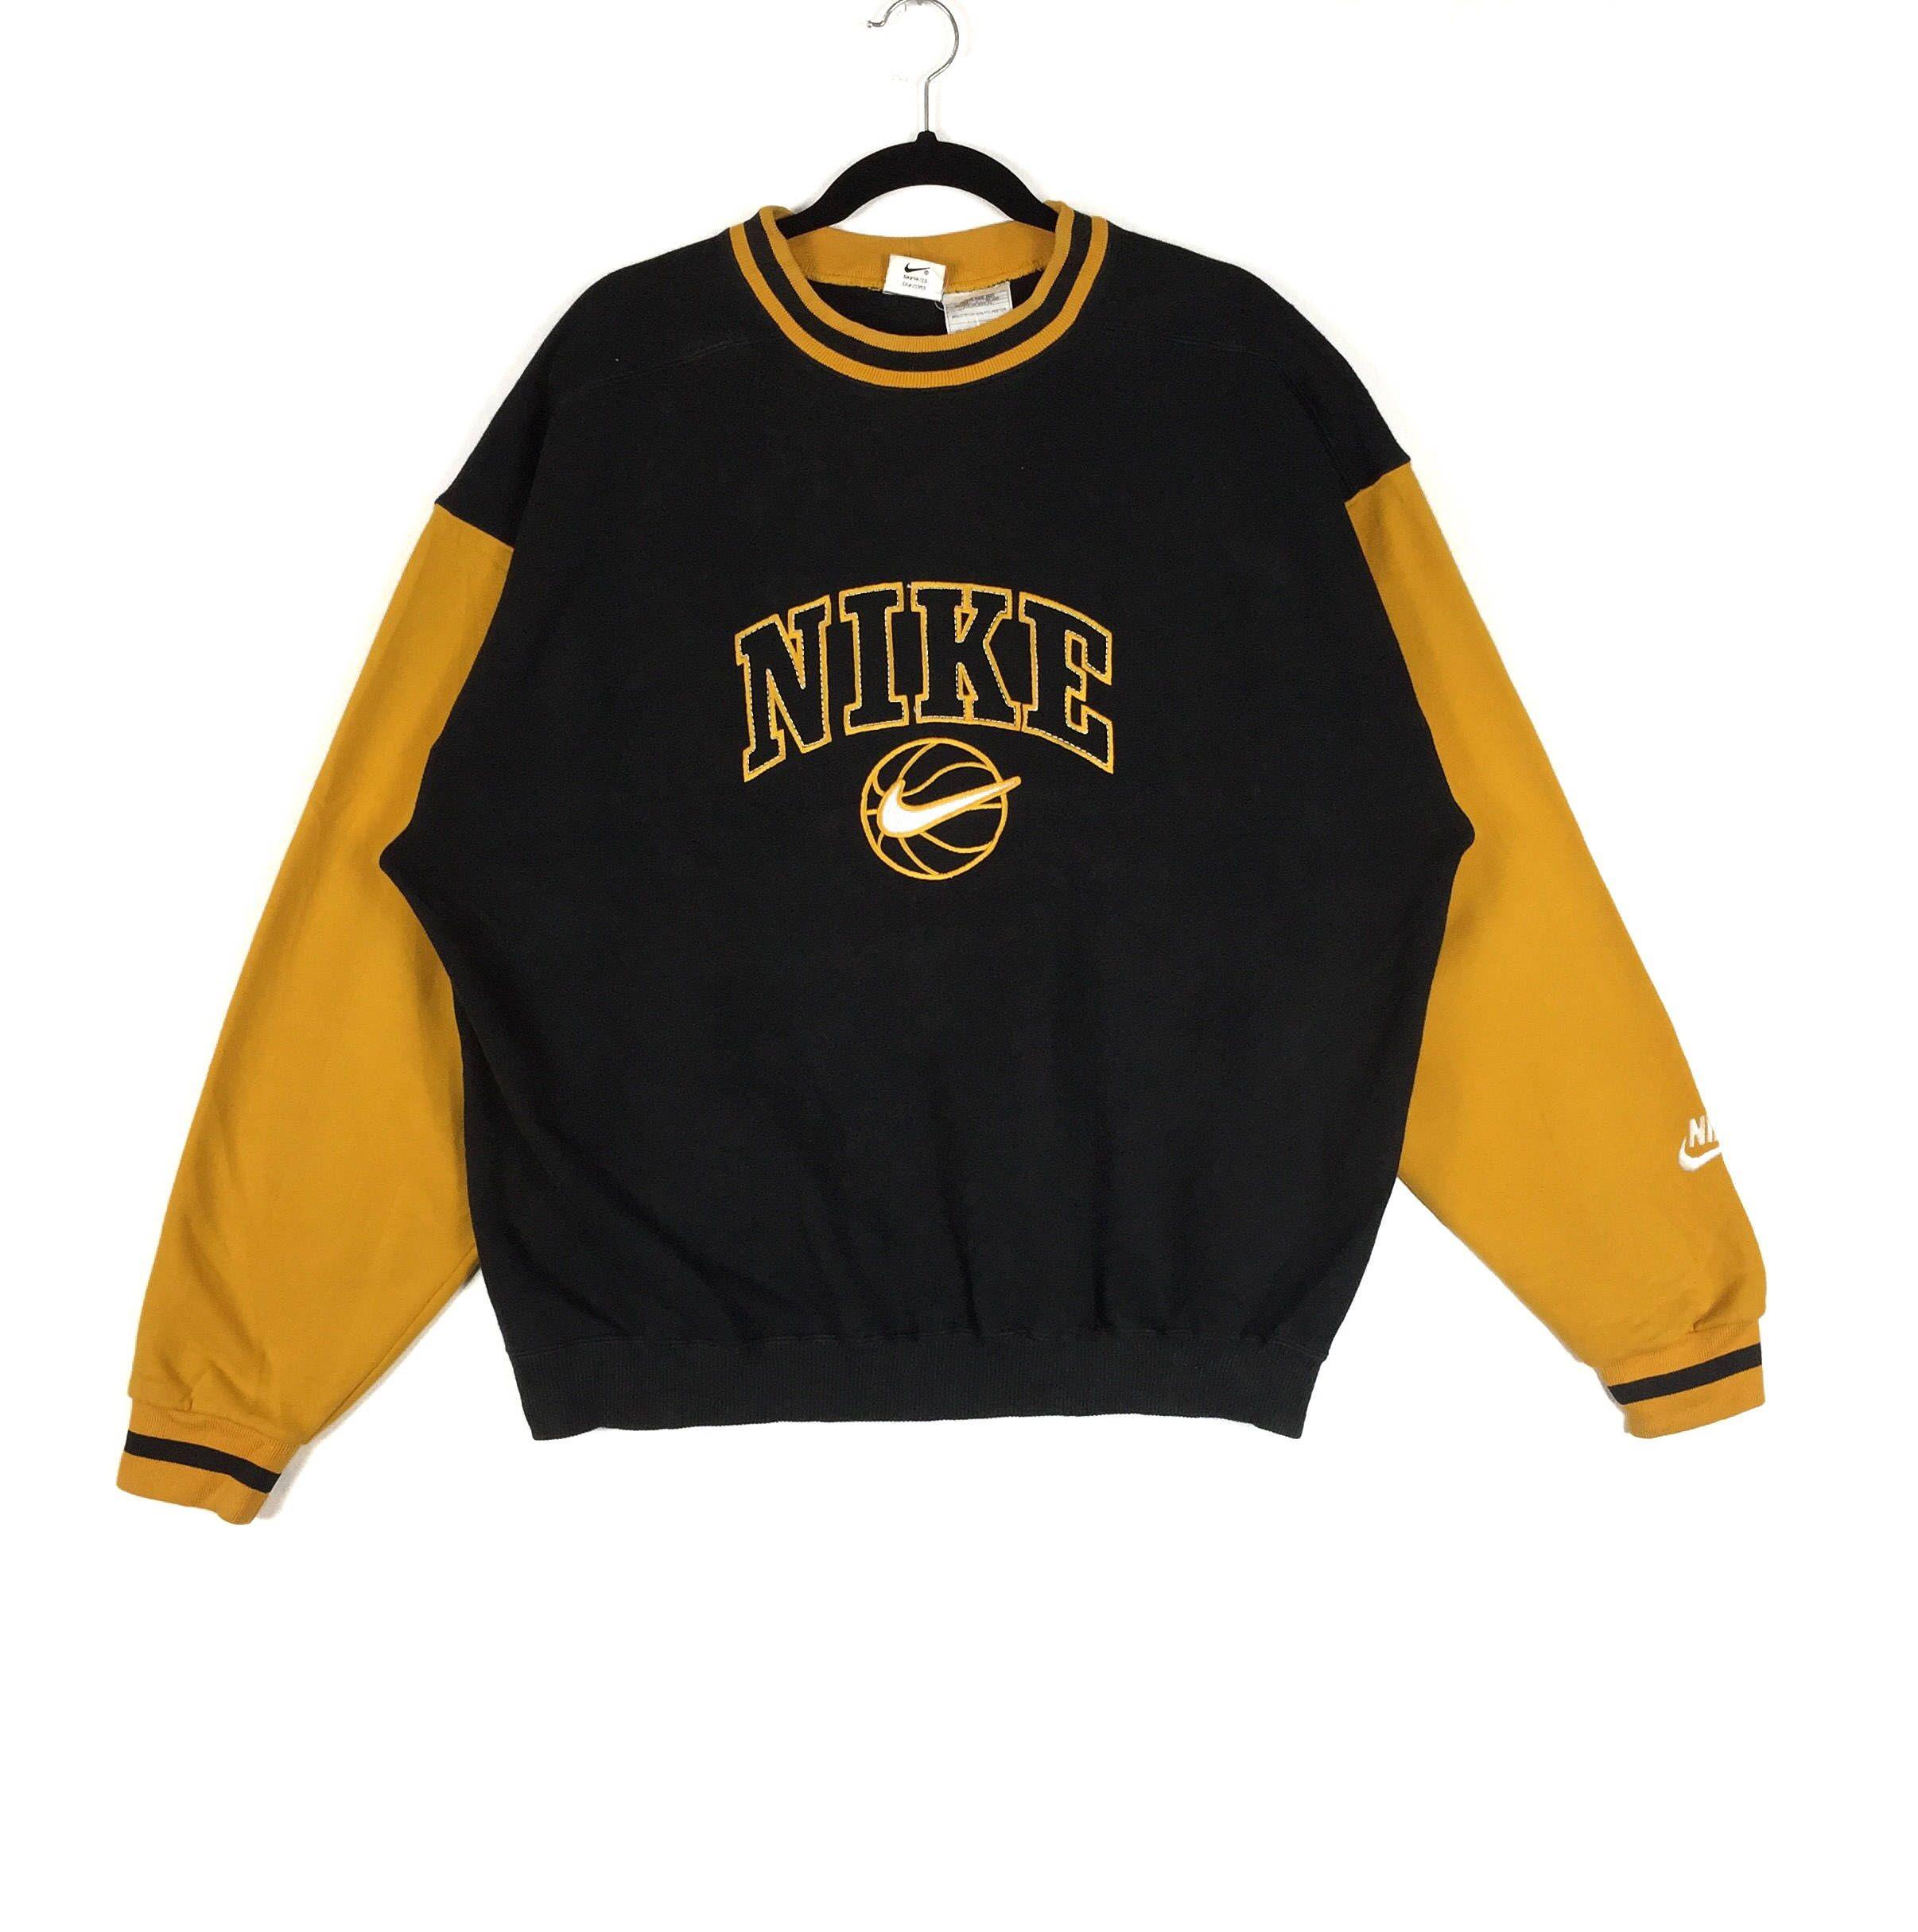 Rare Colour Block Black Yellow Sweatshirt Crew Neck Nike Swoosh Basketball Embroidery Big Logo Nike Sport Fashion Clothing Size Large Sweatshirts Sport Fashion Yellow Sweatshirt [ 2430 x 2412 Pixel ]